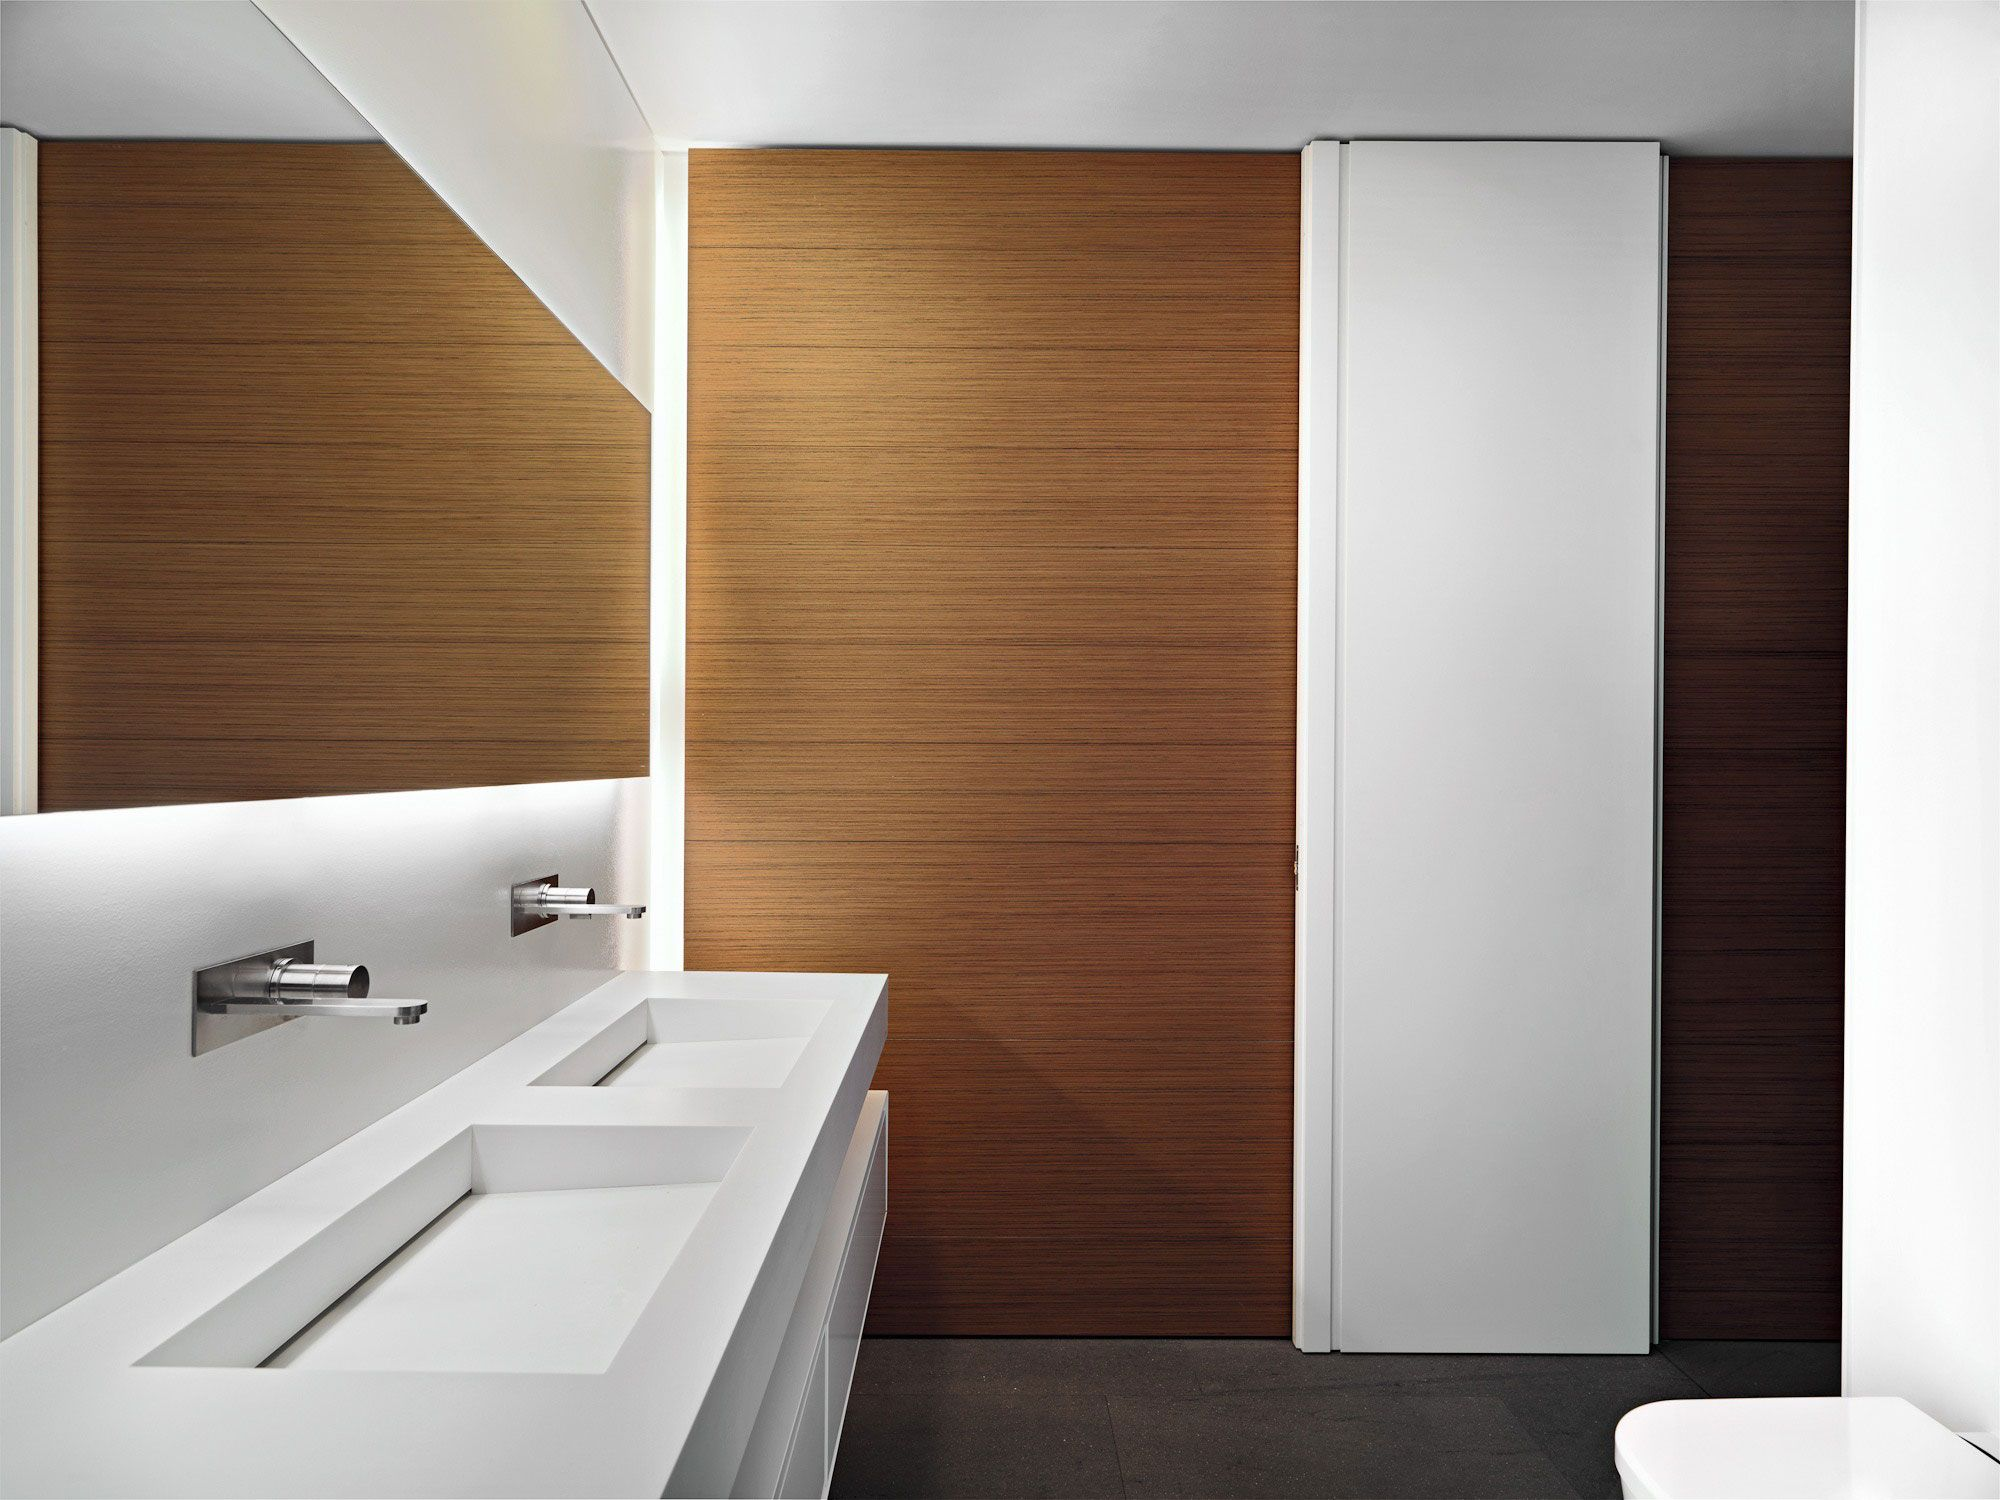 Bathroom Laminate Wall Covering Design Ideas Bathroom Interior White Bathroom Interior Bathroom Wall Panels